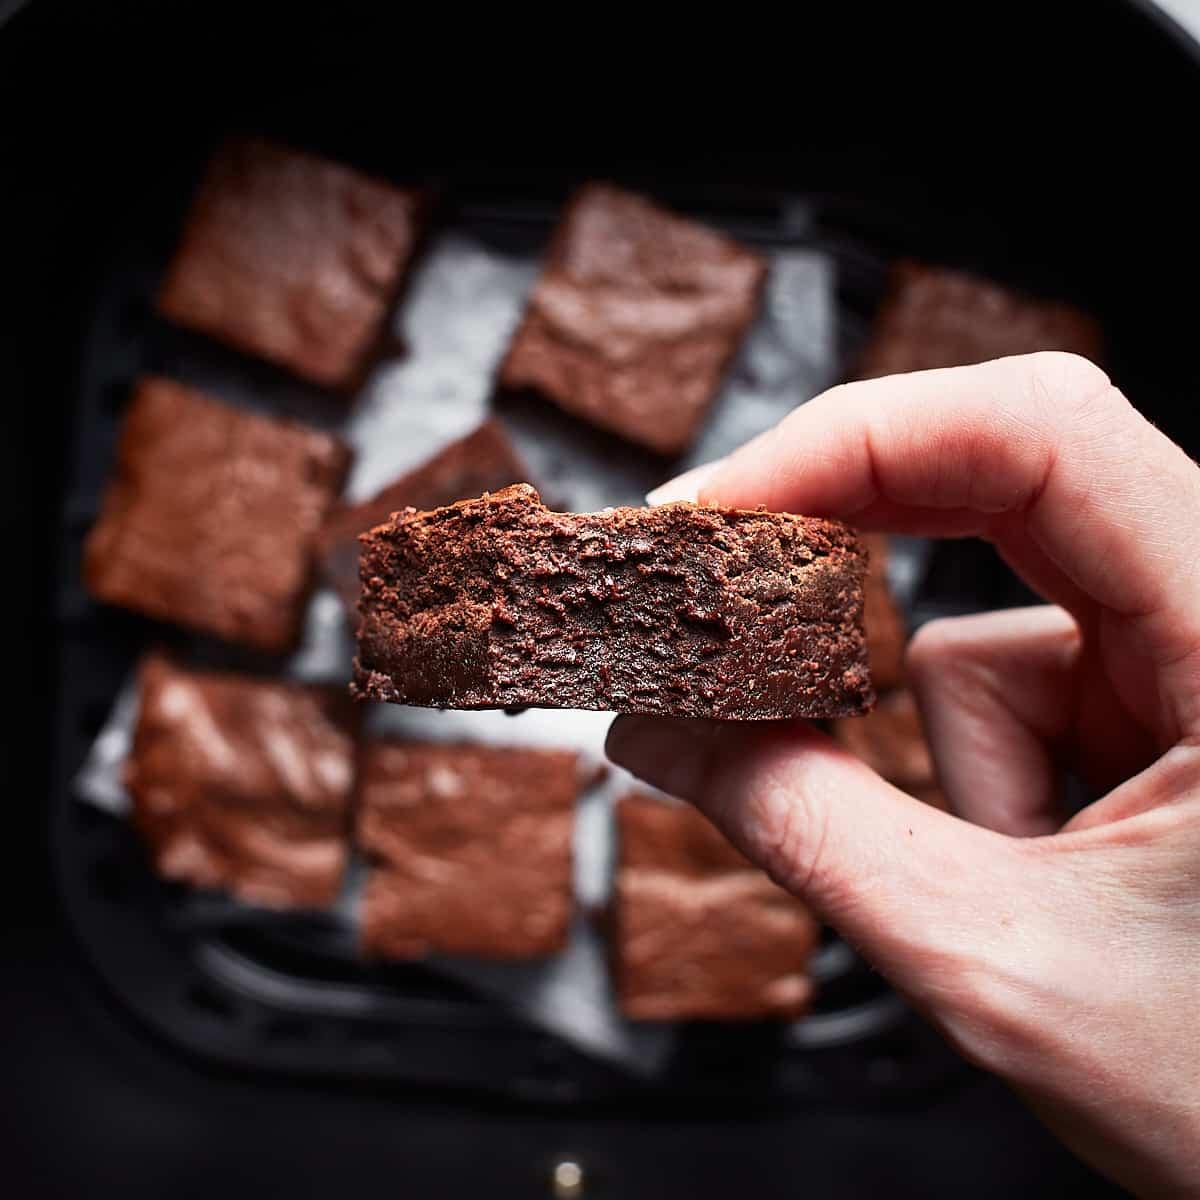 Holding a bitten brownie between fingers